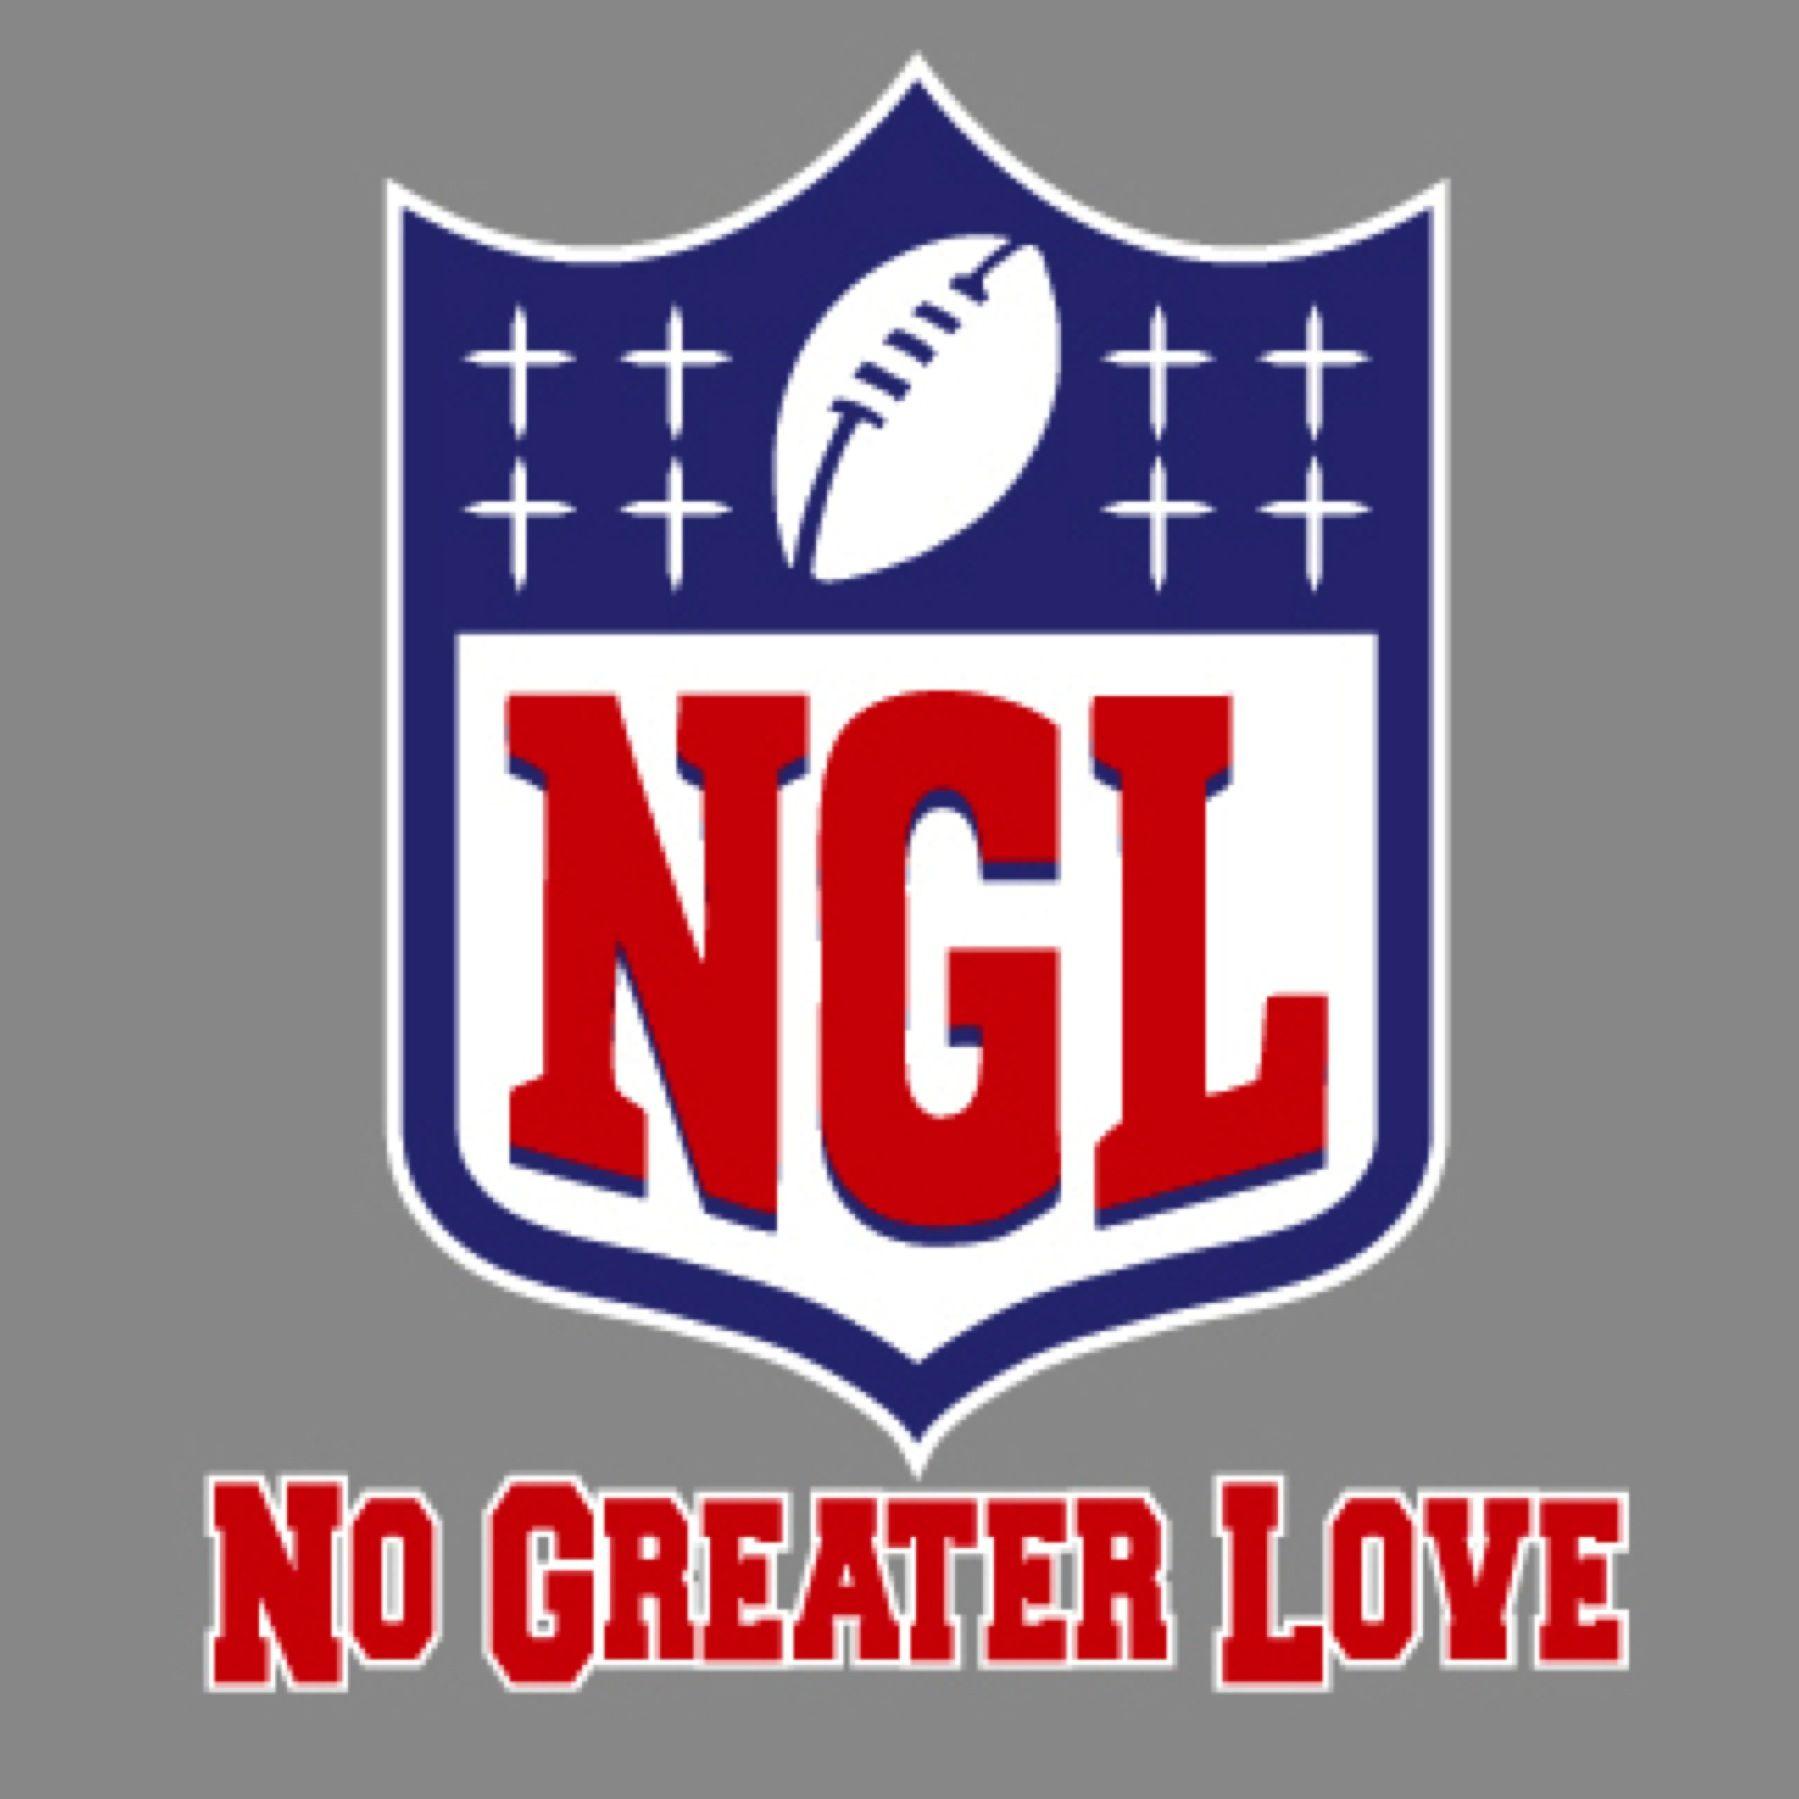 Christian sports parody tshirt design for NFL fans